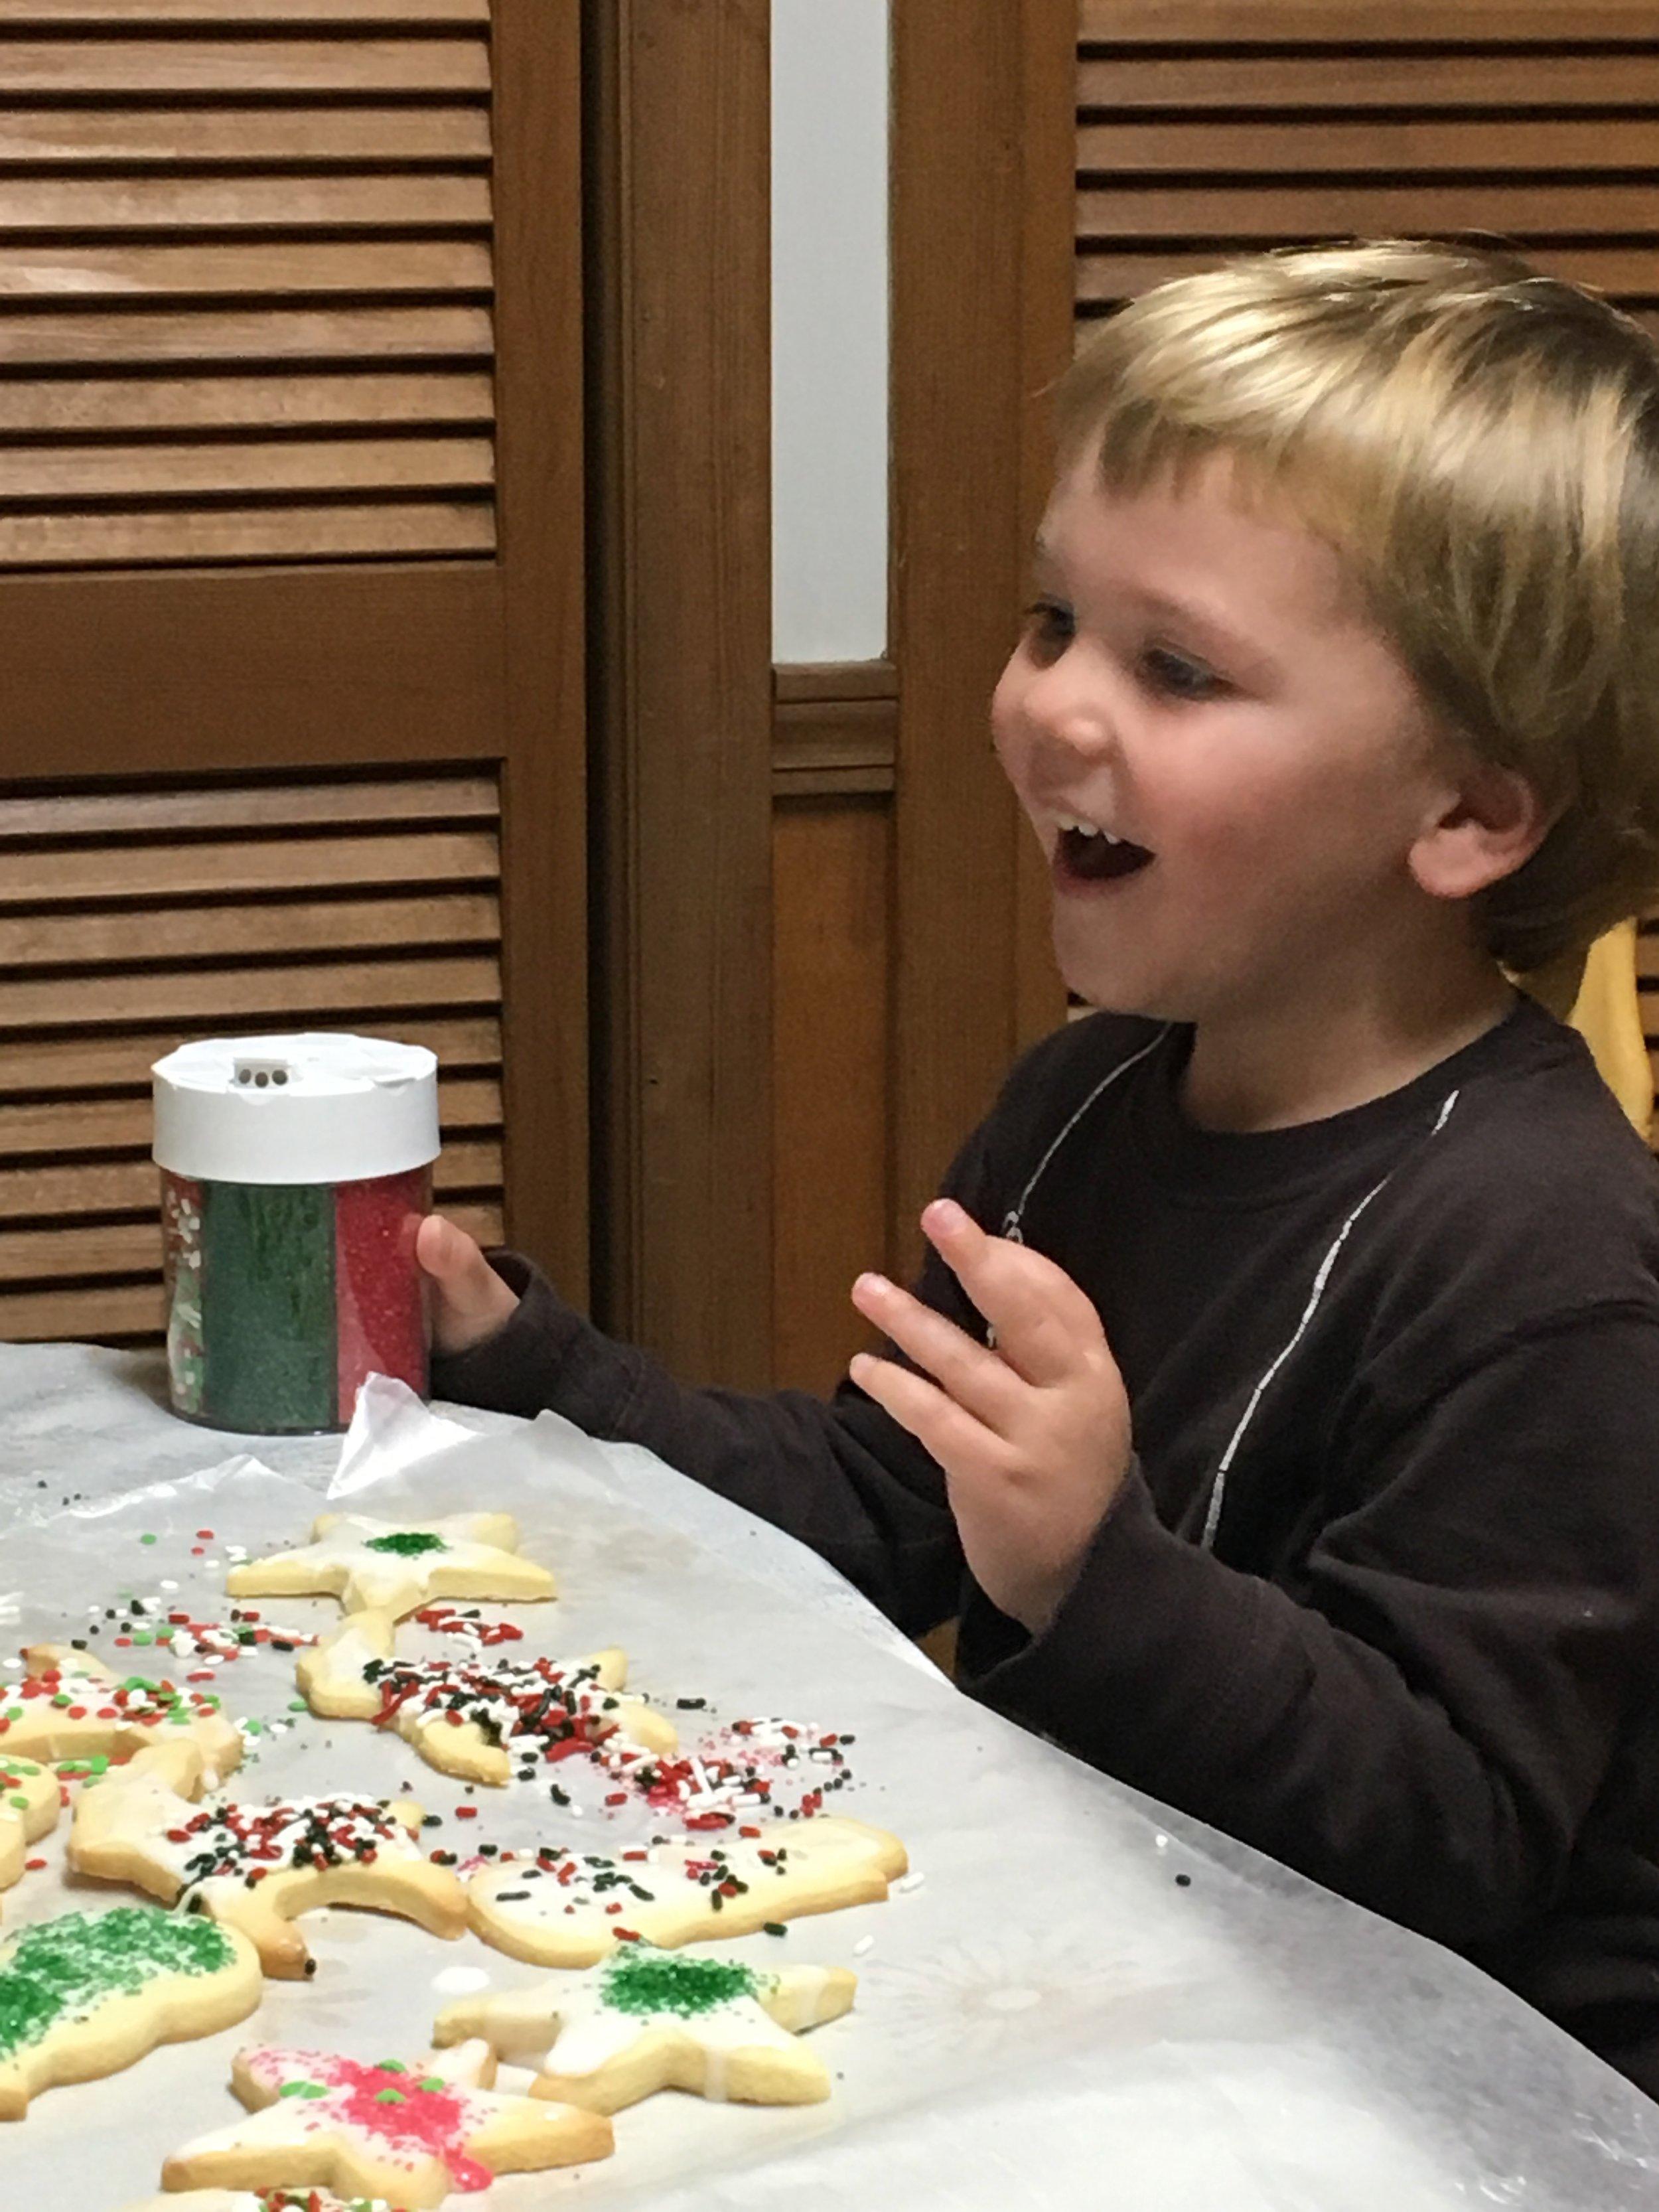 W51: Decorating cookies